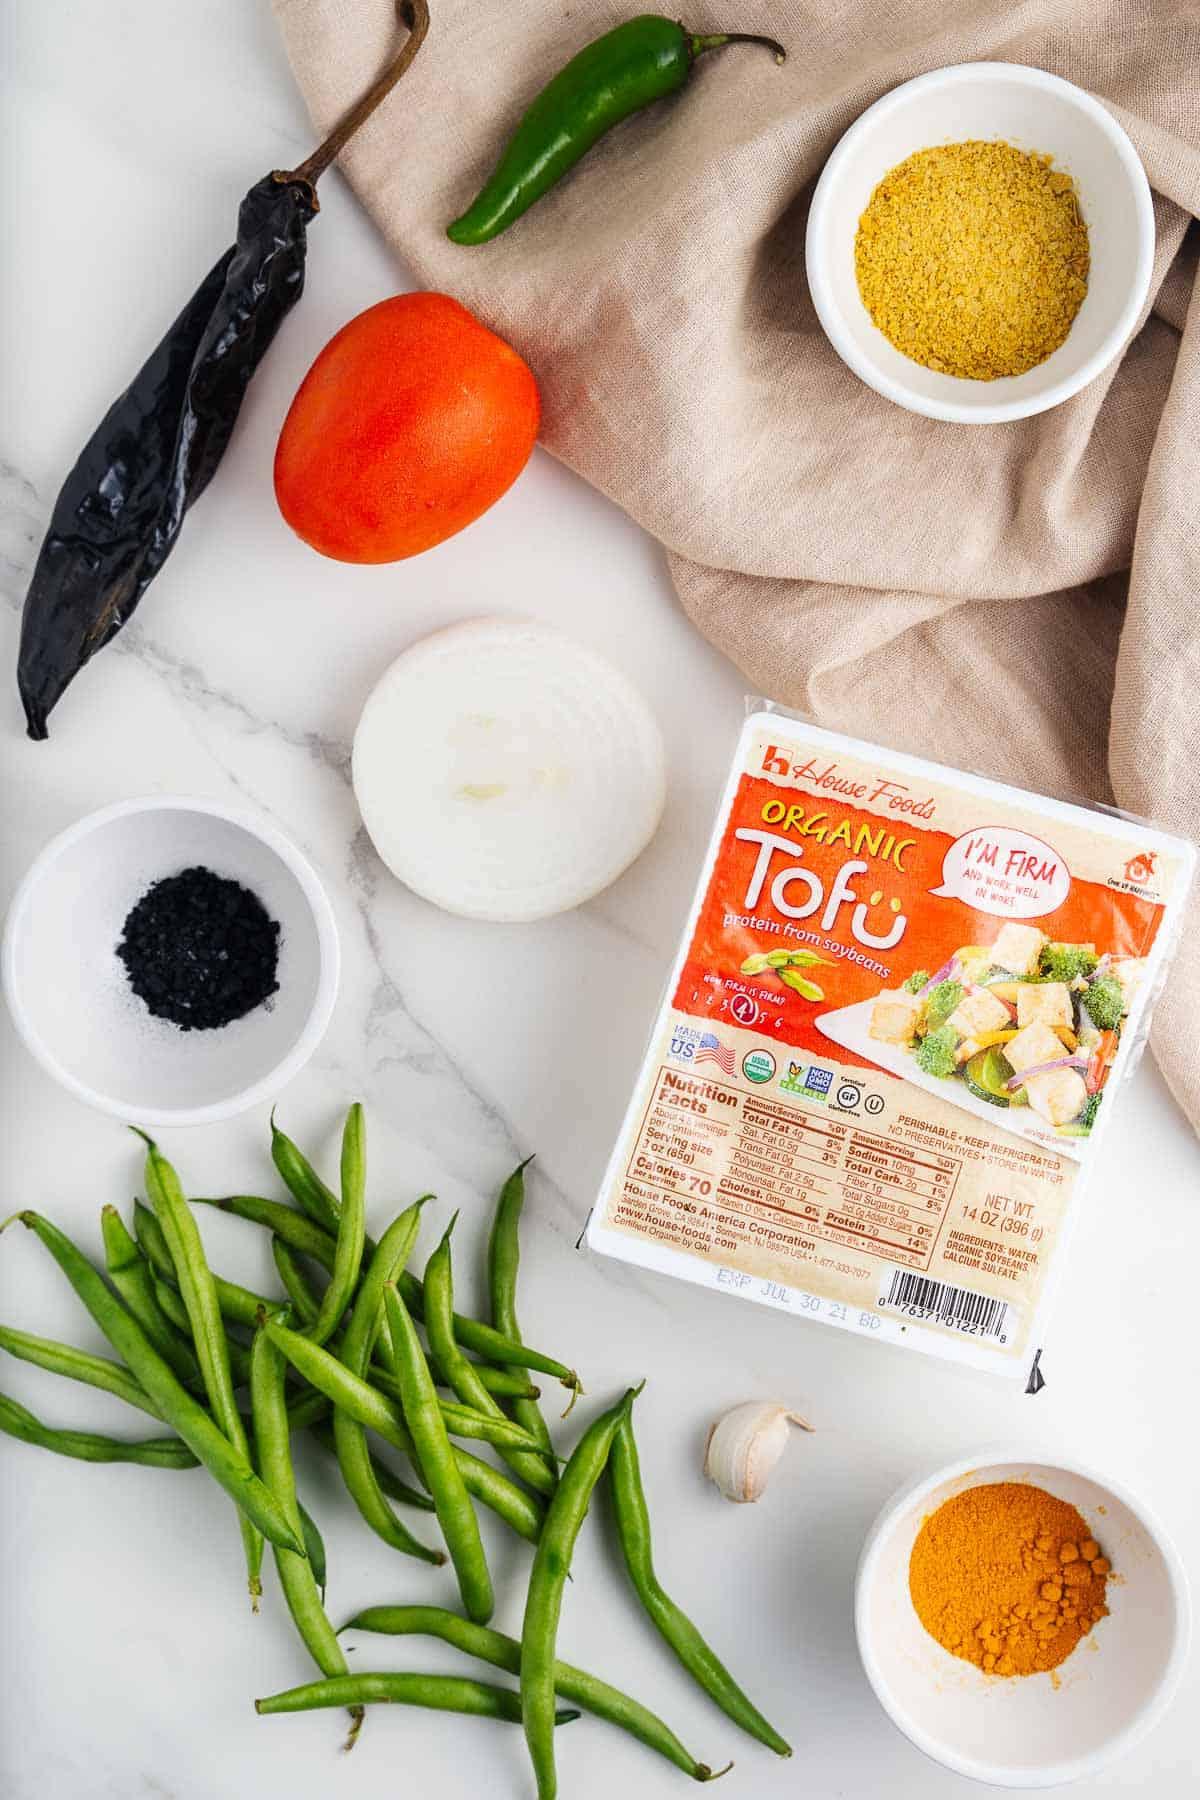 Tofu, Green Beans, Tomato, Chiles, Garlic, Onion, Black Salt, Nutritional Yeast, and Turmeric